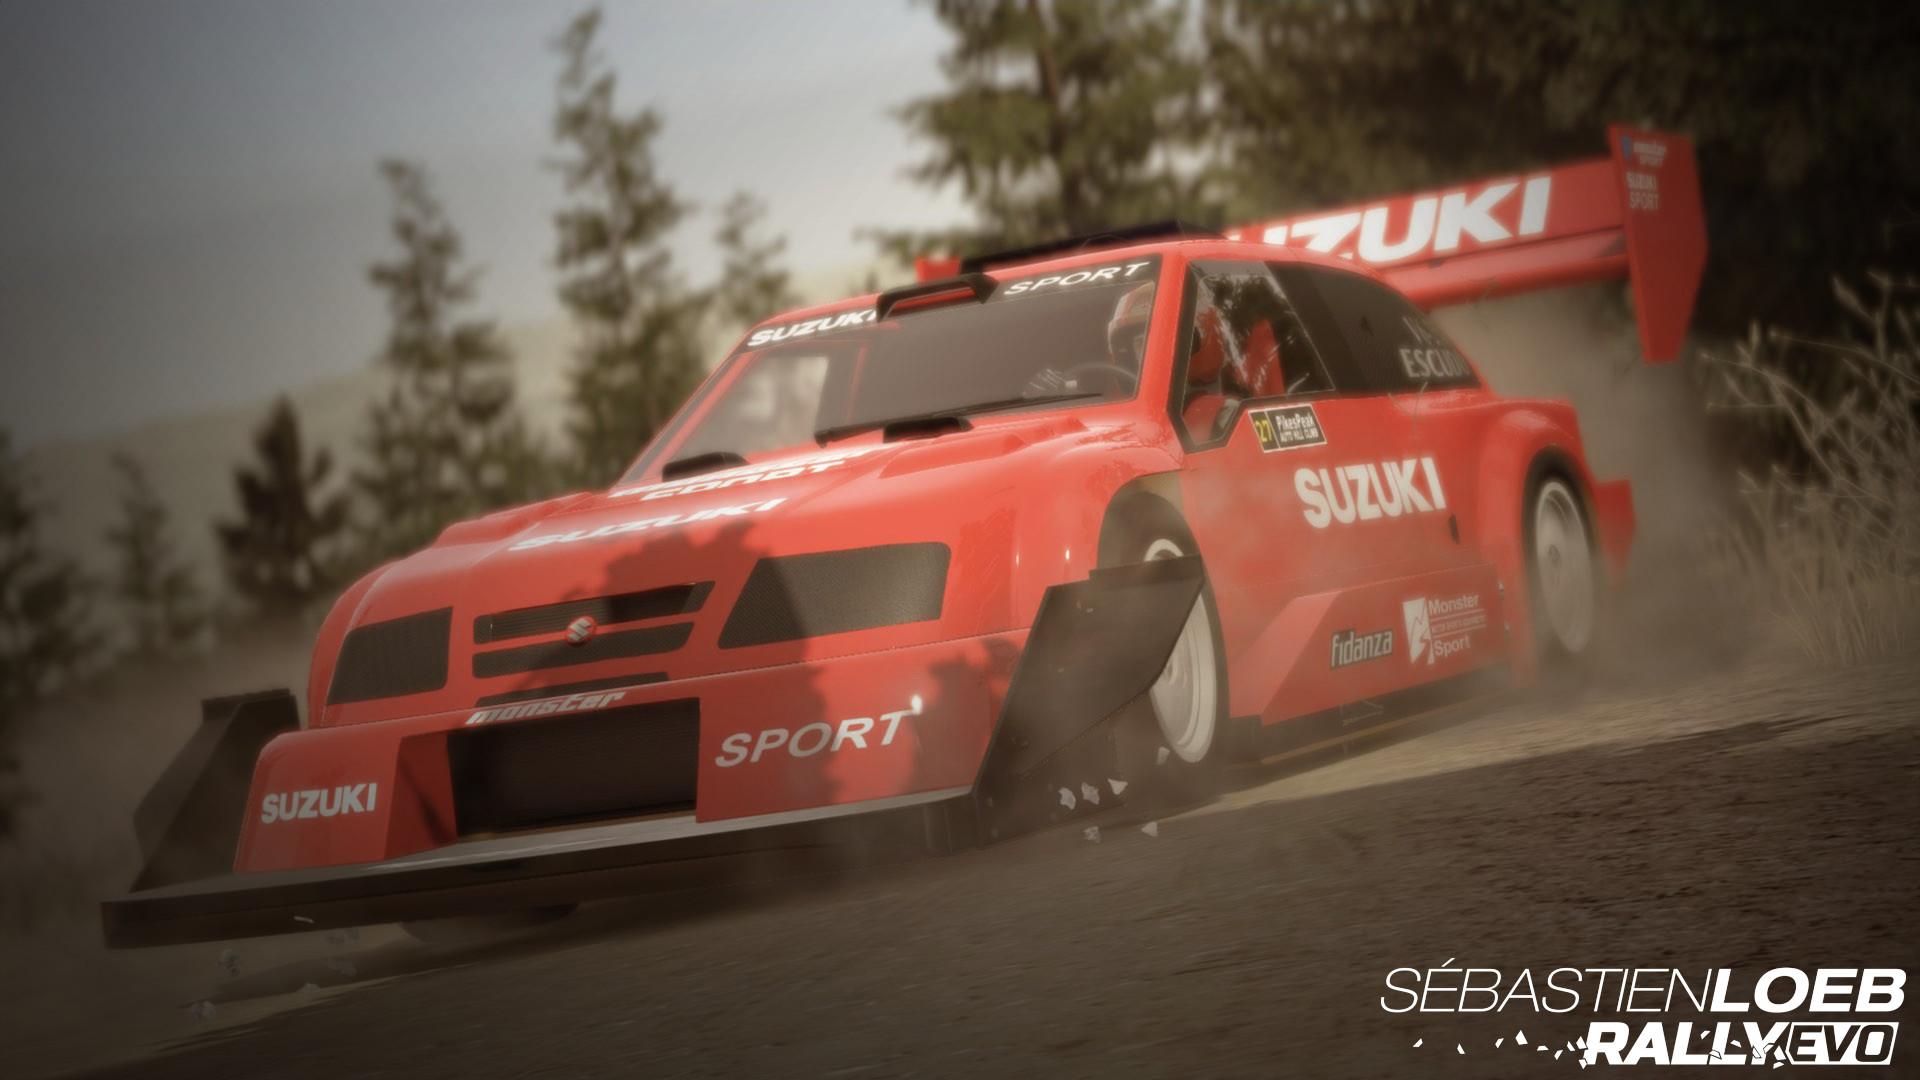 Sébastien Loeb Rally EVO - Pikes Peak Pack Suzuki Escudo PP screenshot